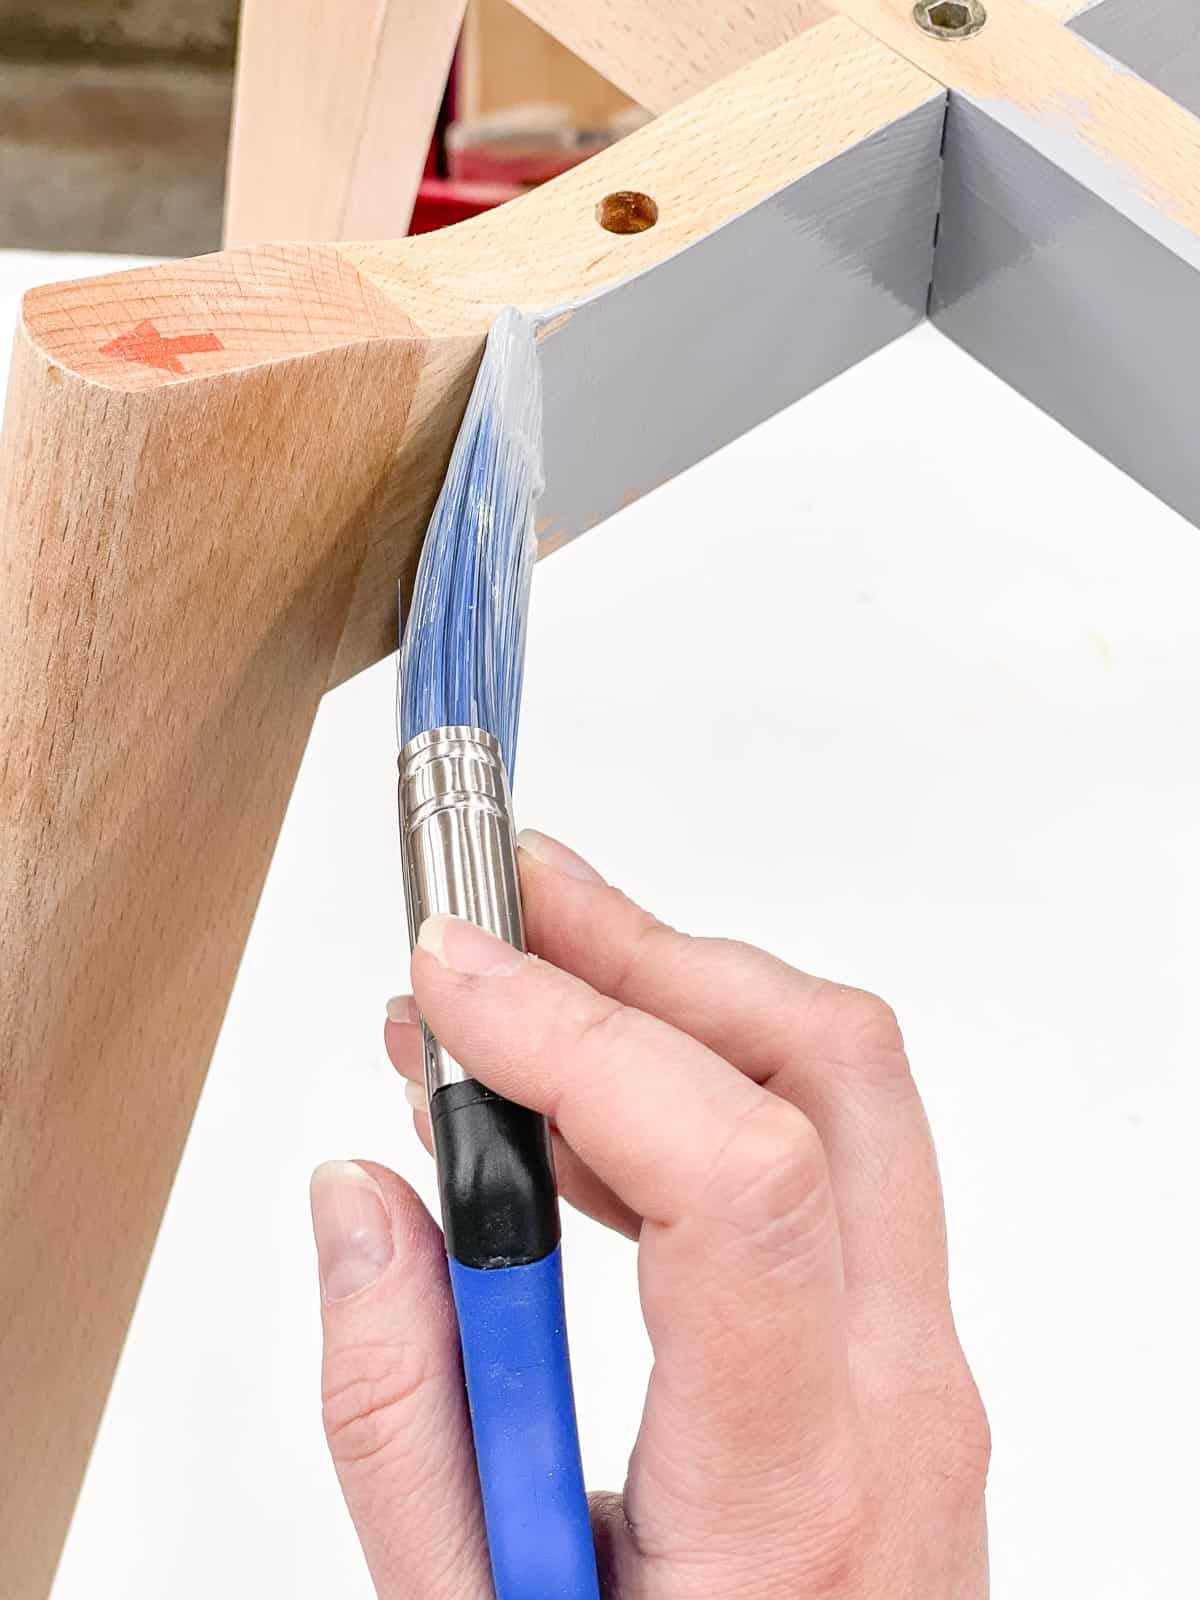 applying cool tone primer to chair base before applying metallic paint